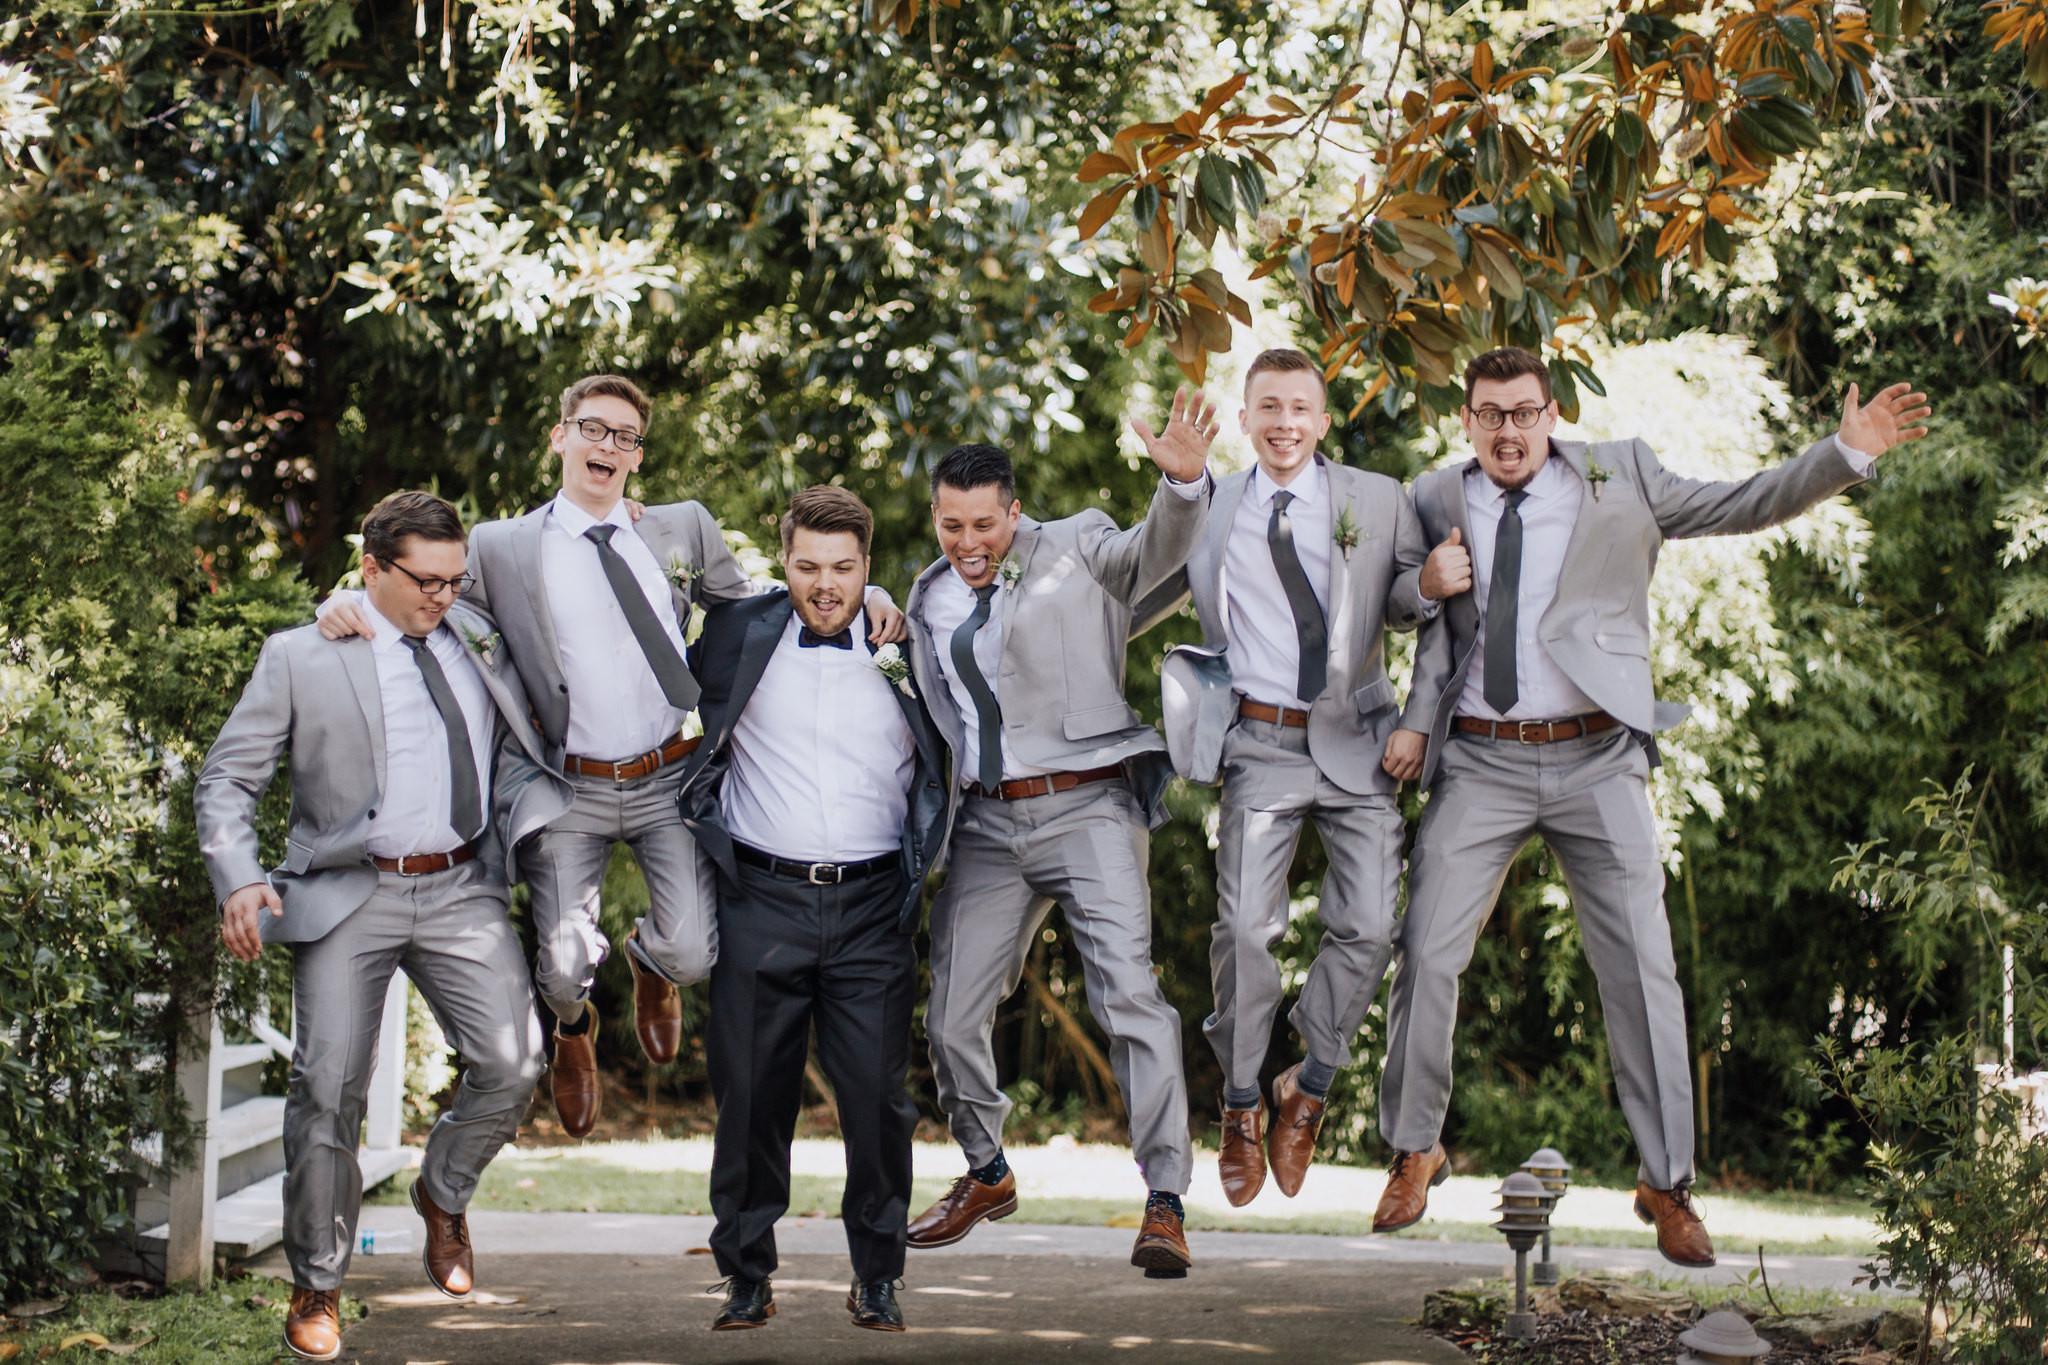 Weddings - THE DOCUMENTARY